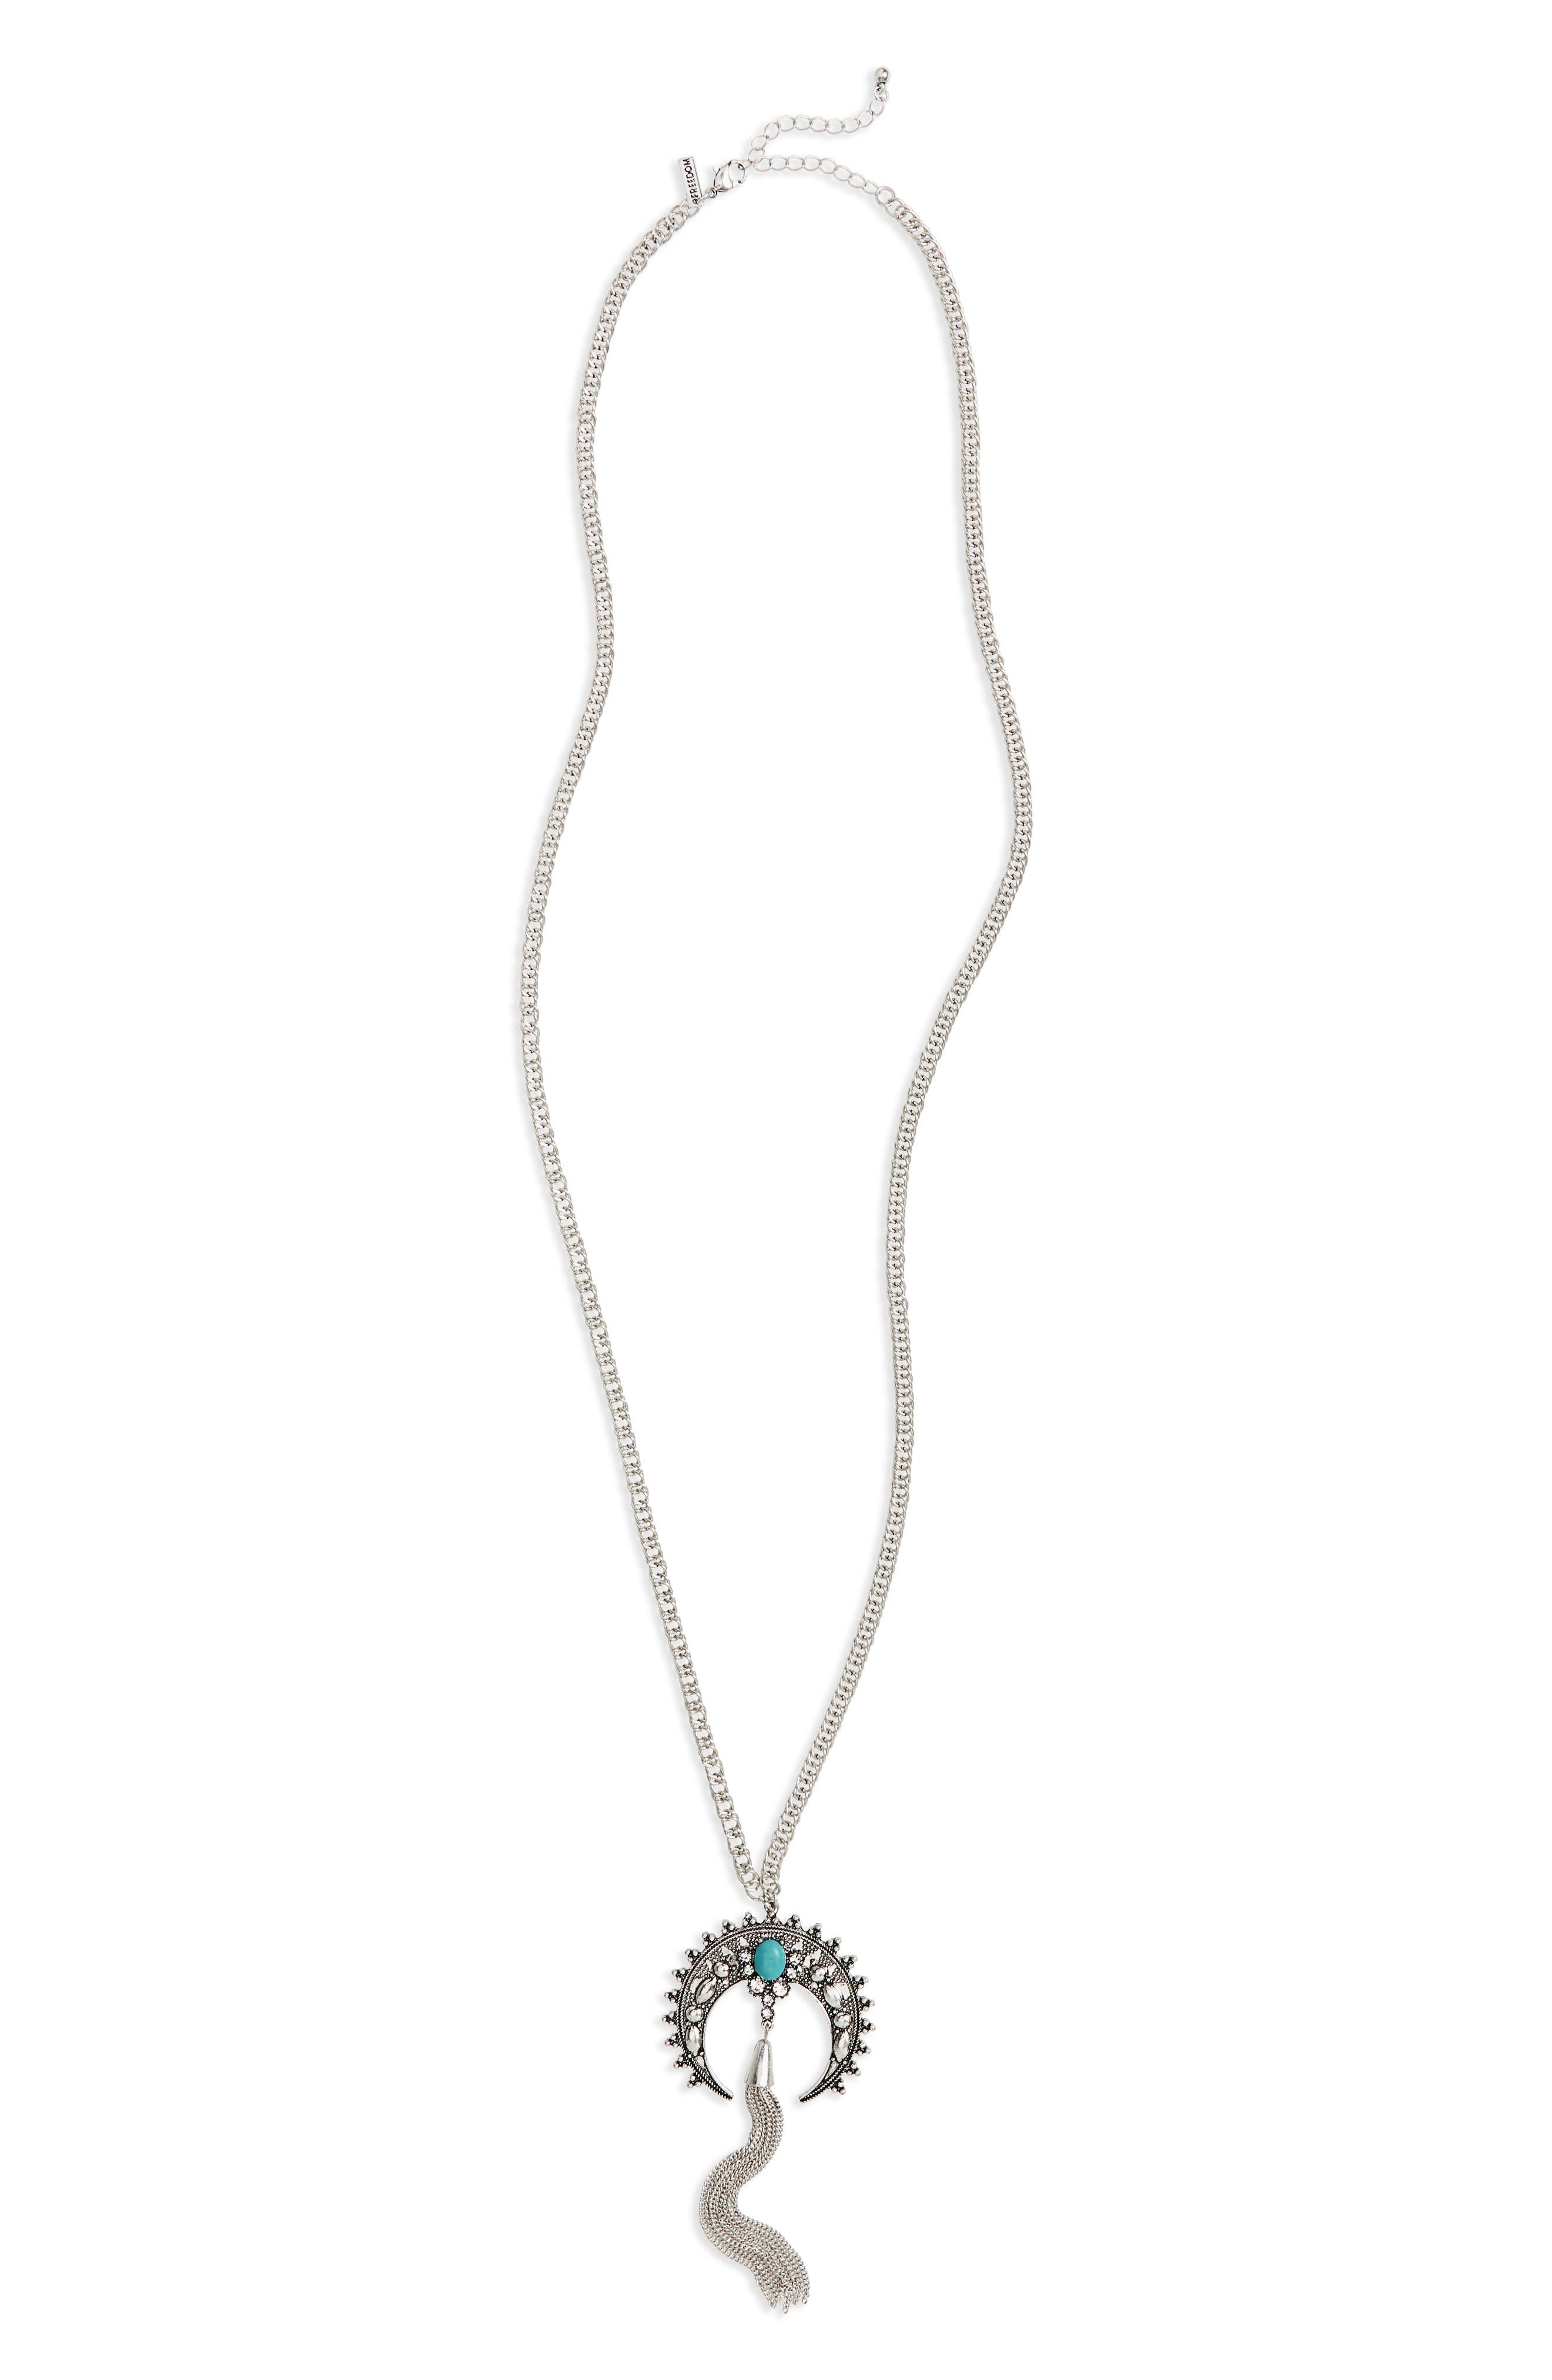 Topshop Turquiose Horn Tassel Necklace